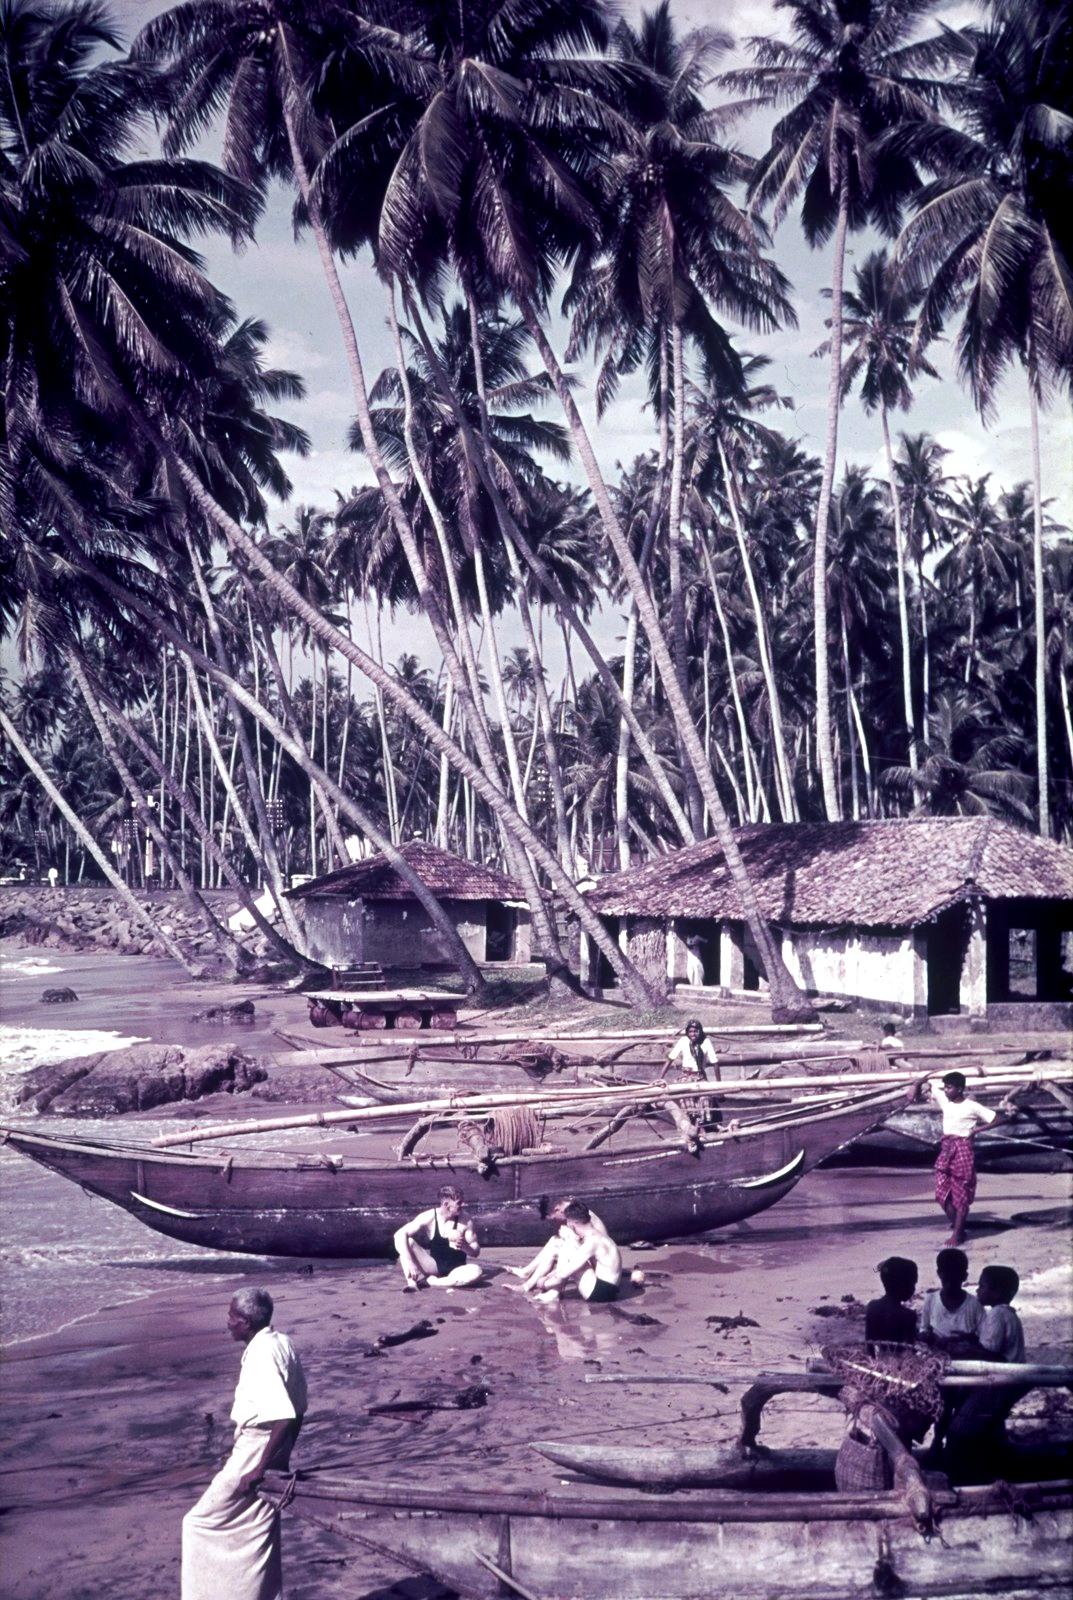 Гаити. Лодки на берегу под пальмами.